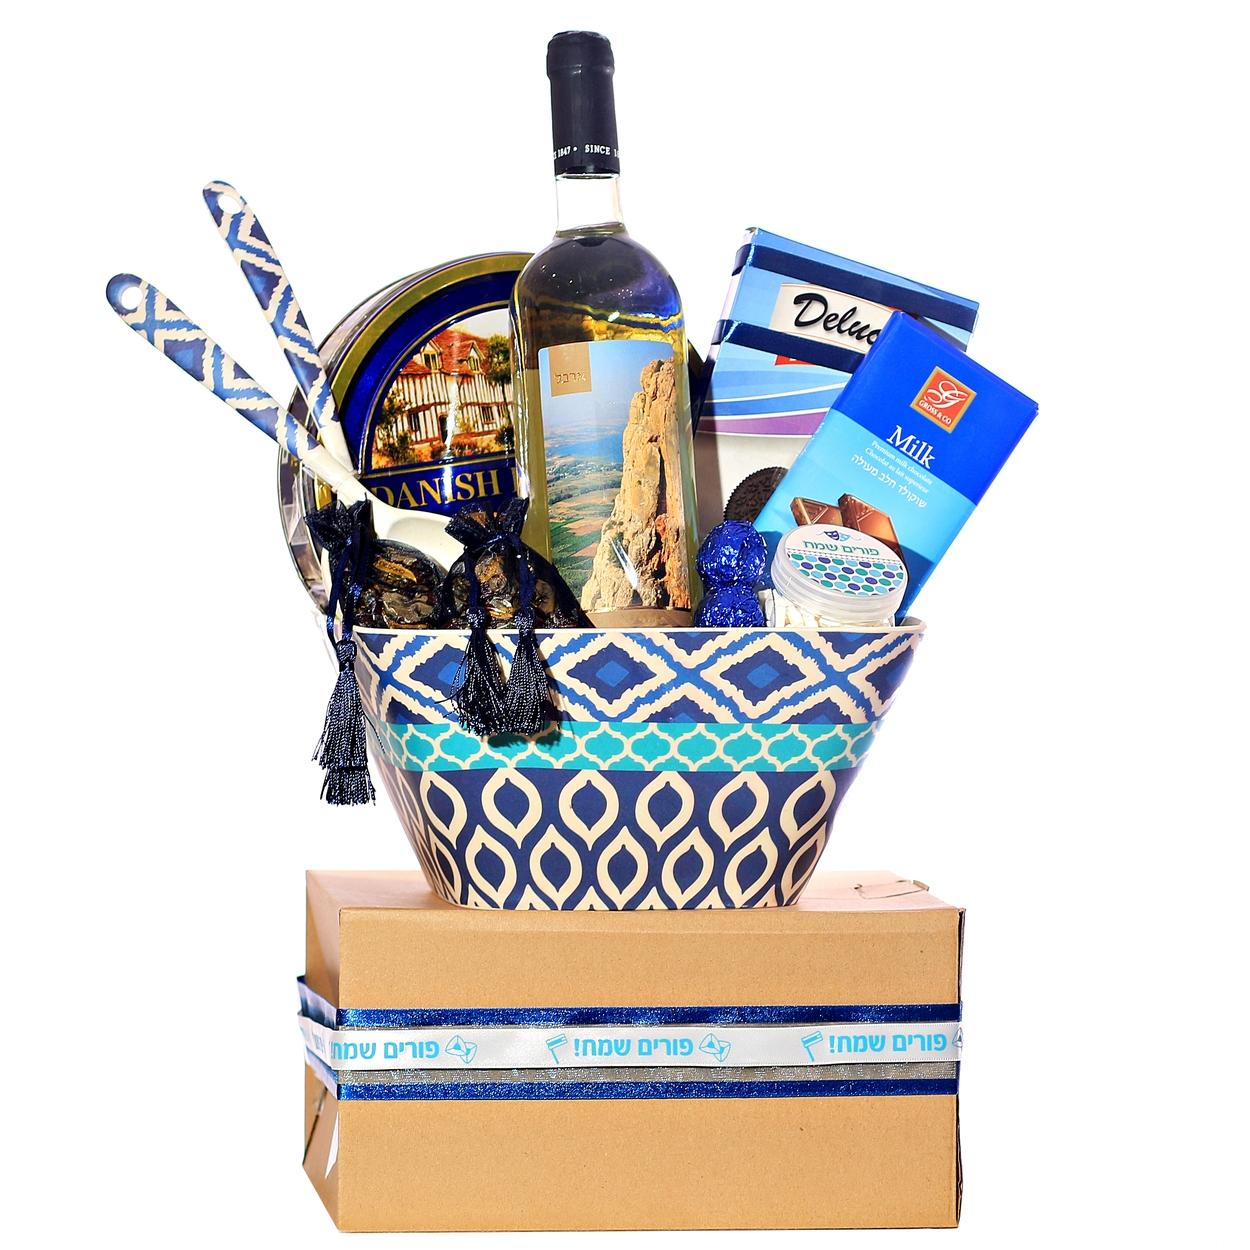 purim salad dish gift basket israel only purim baskets